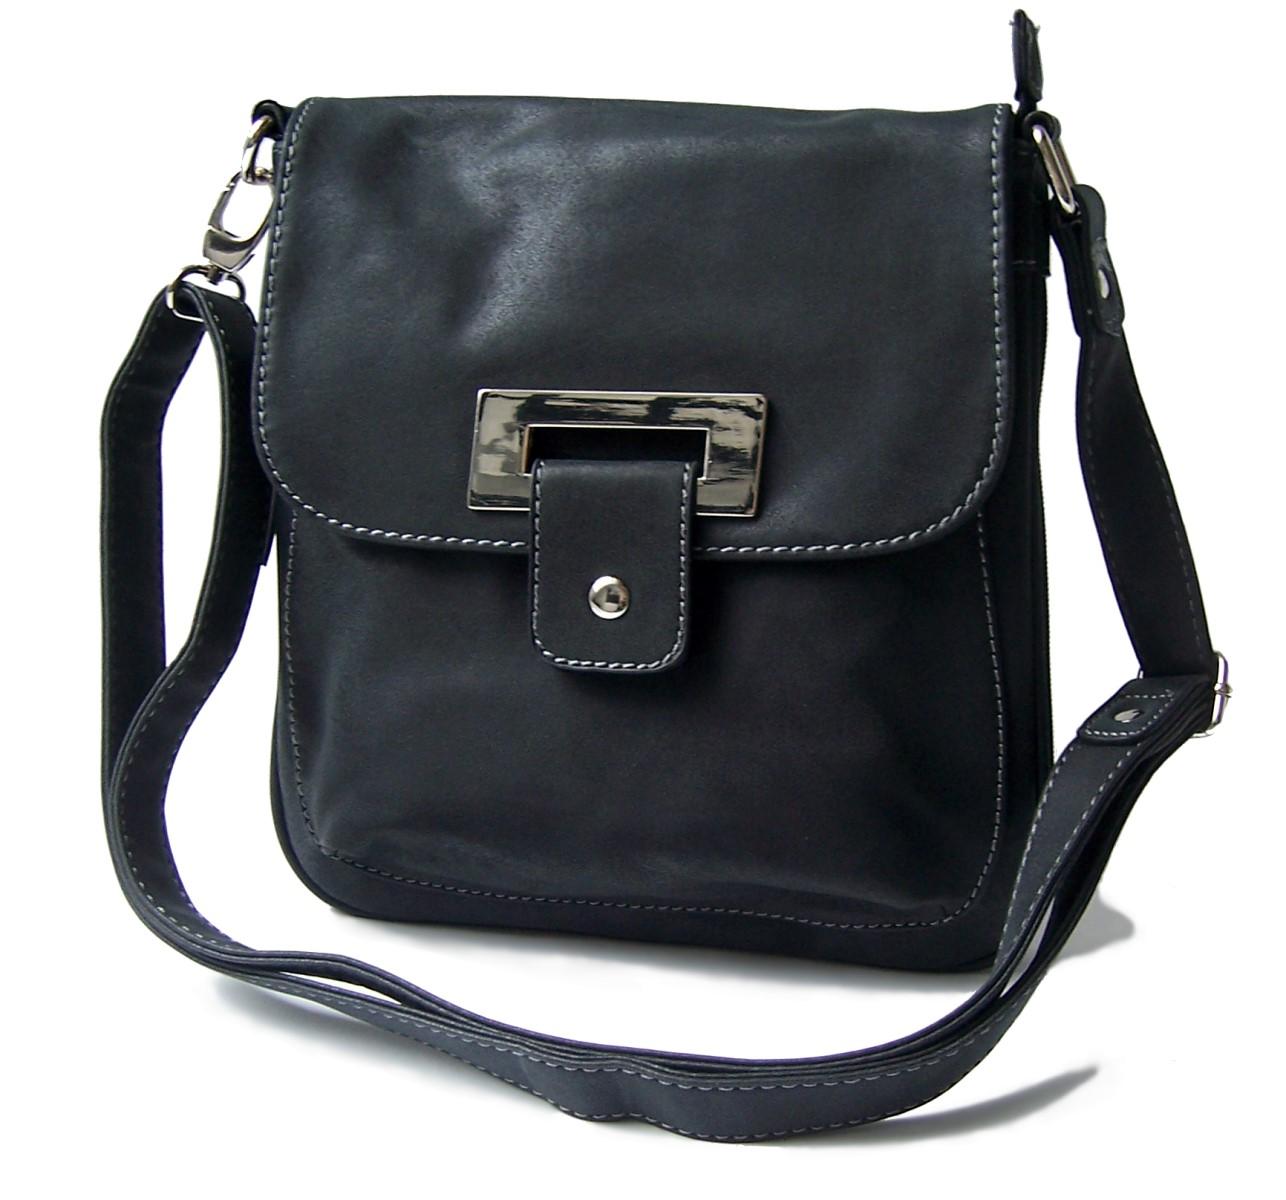 bd62b011161c0 Handtasche Umhängetasche Leder-Look schwarz Damen Bag Street Ta8004